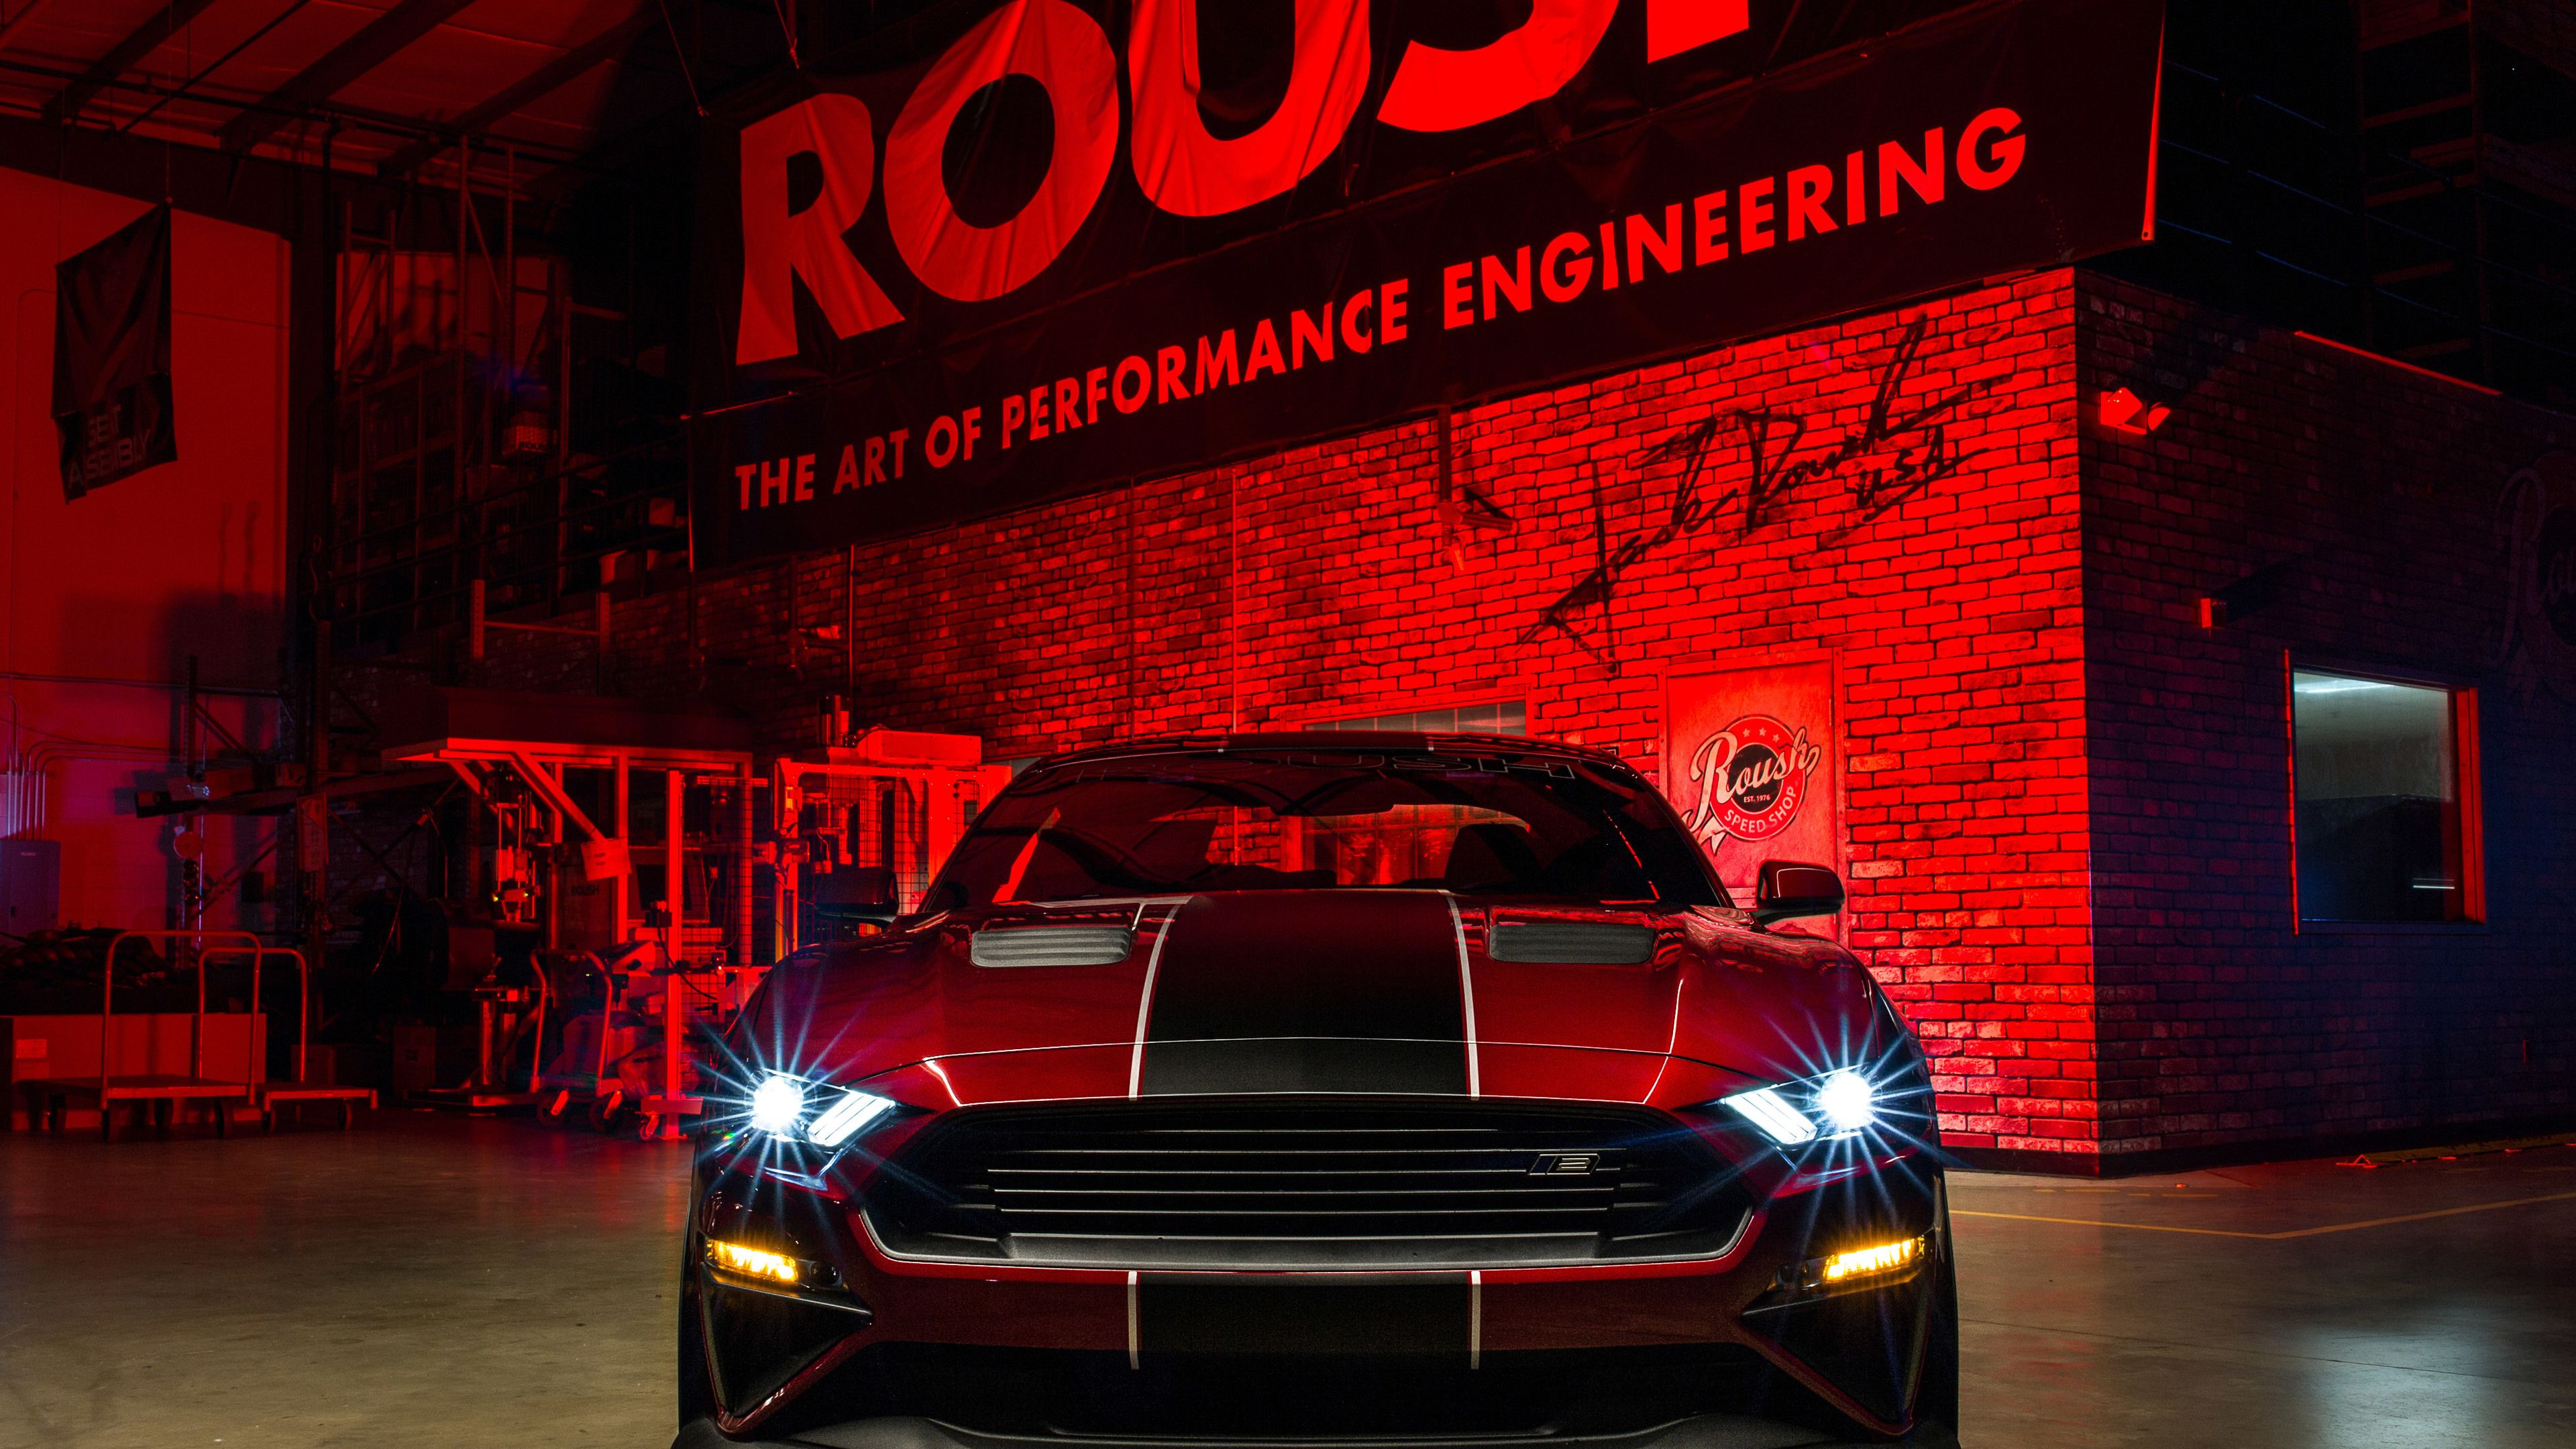 Wallpaper 4k 2018 Roush Rs2 2018 Cars Wallpapers 4k Wallpapers